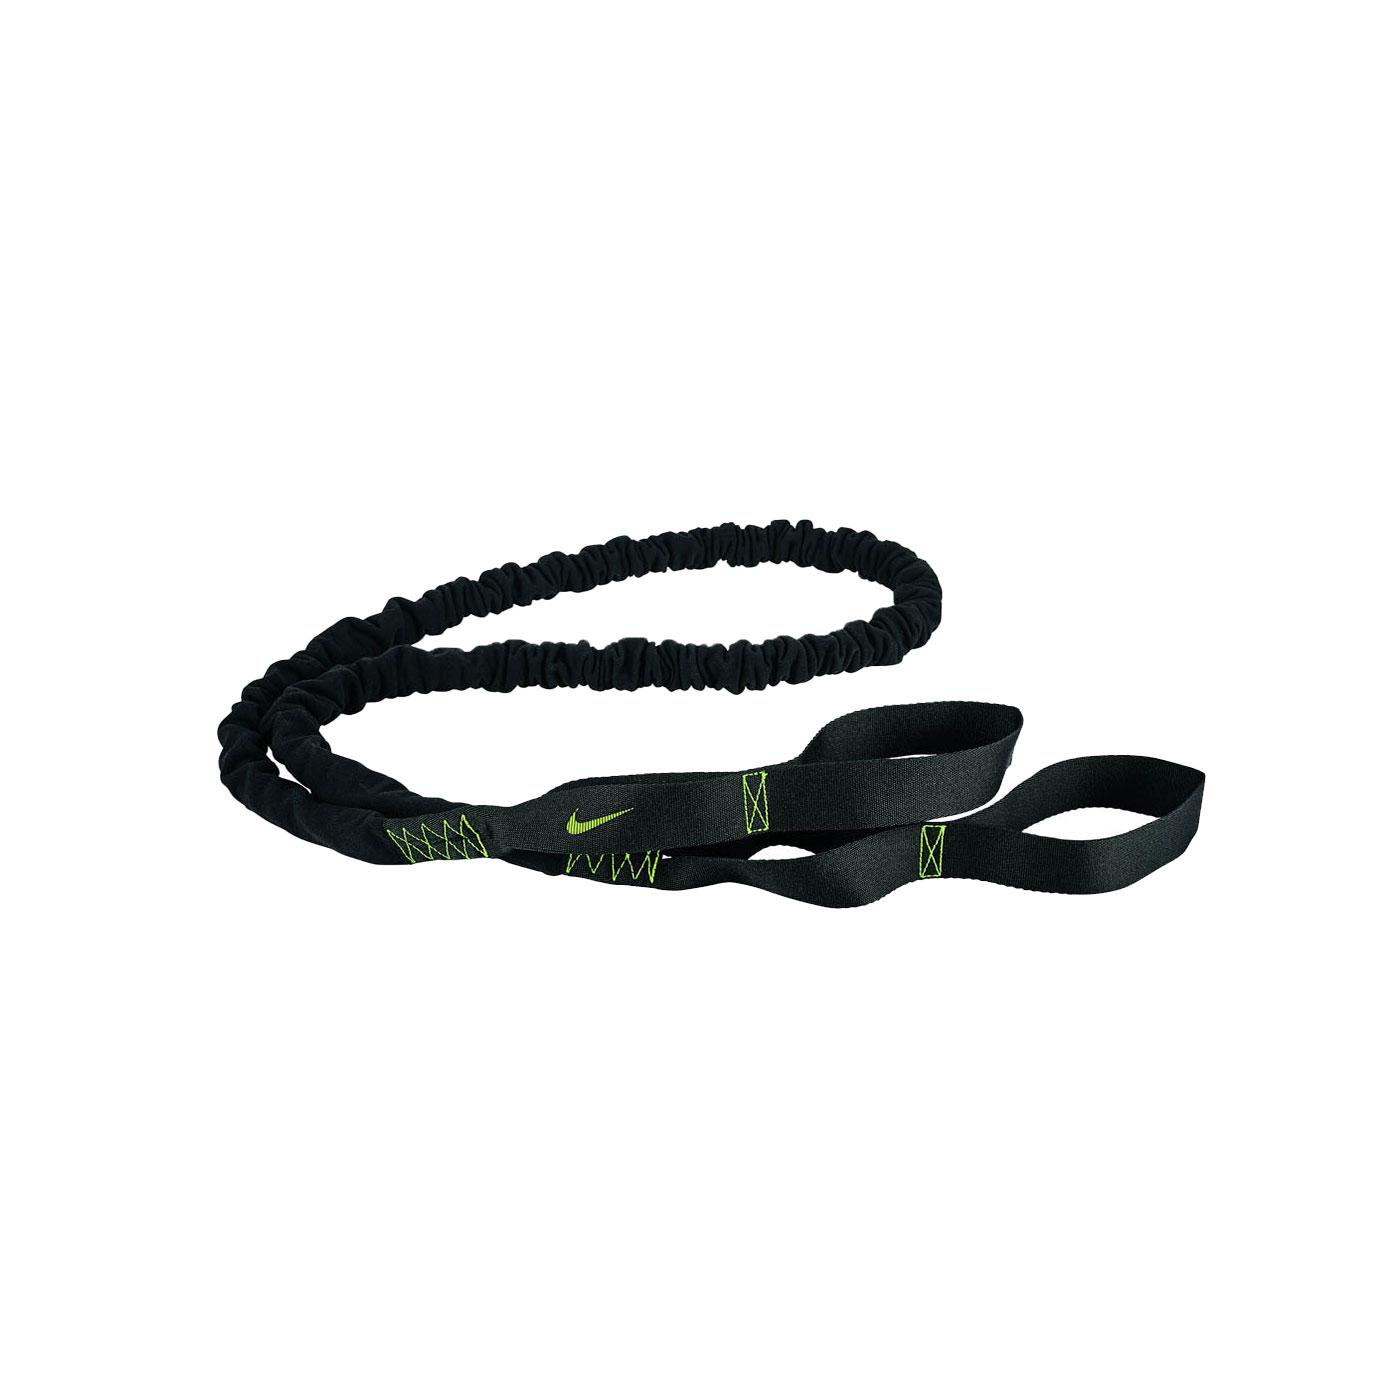 NIKE 抗阻彈力繩 20lbs N0000009023OS - 黑綠